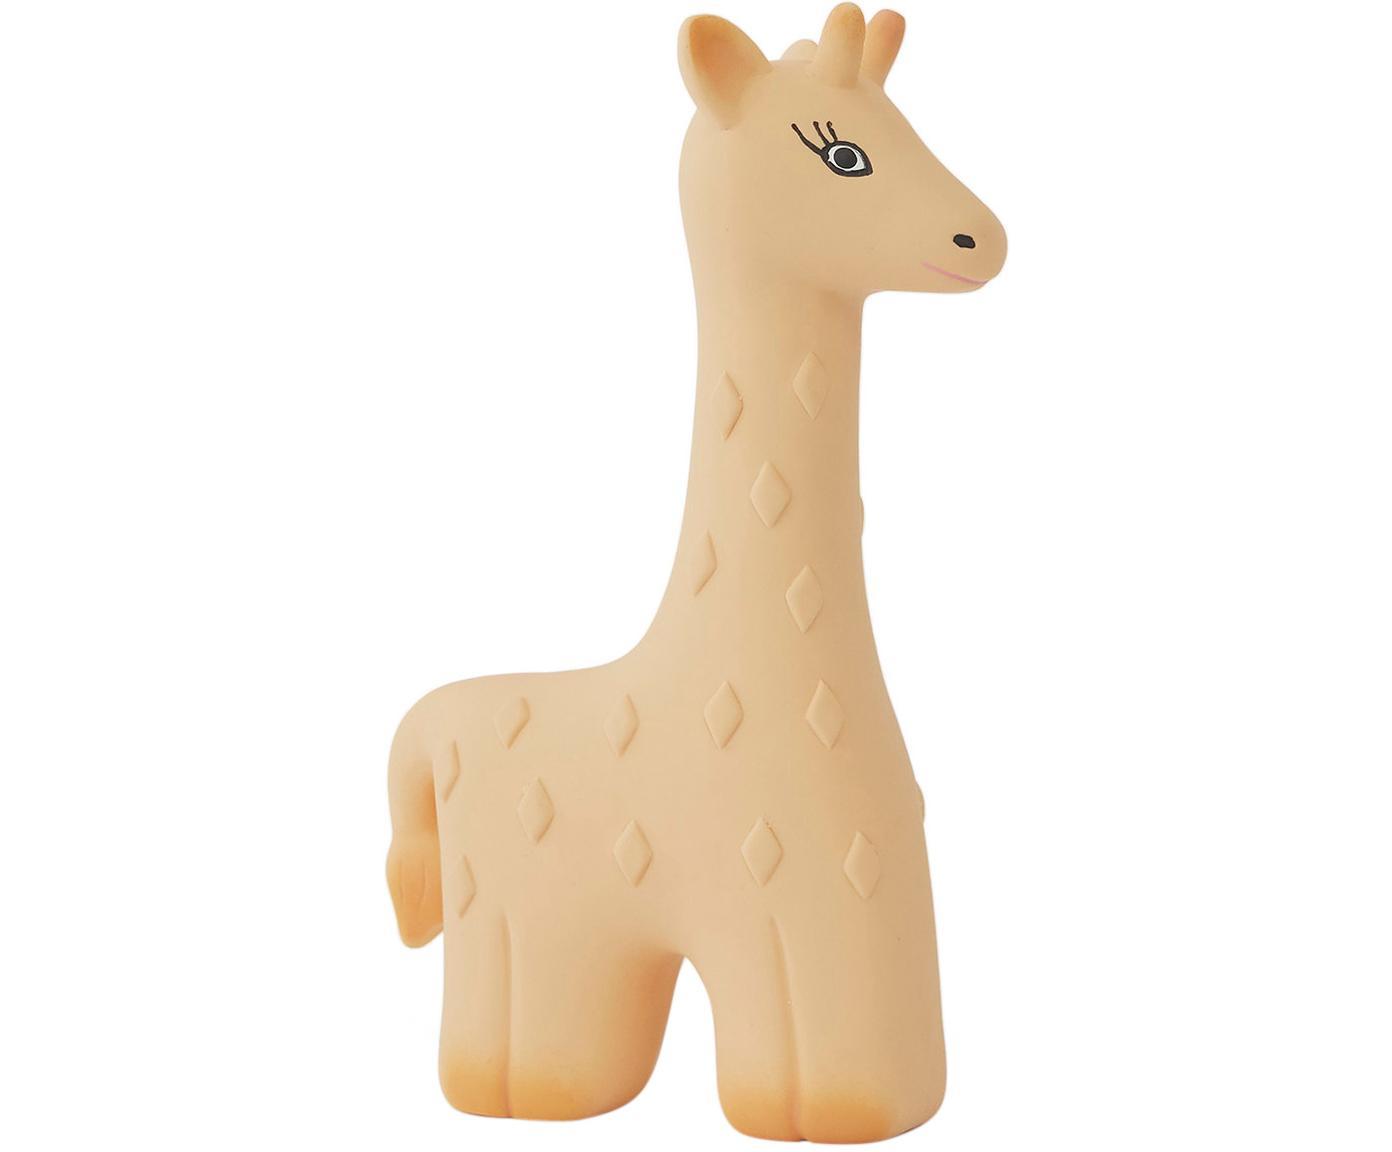 Jugete mordedor Giraffe Noah, Goma, BPA y libres de ftalatos, Beige, negro, An 10 x Al 15 cm